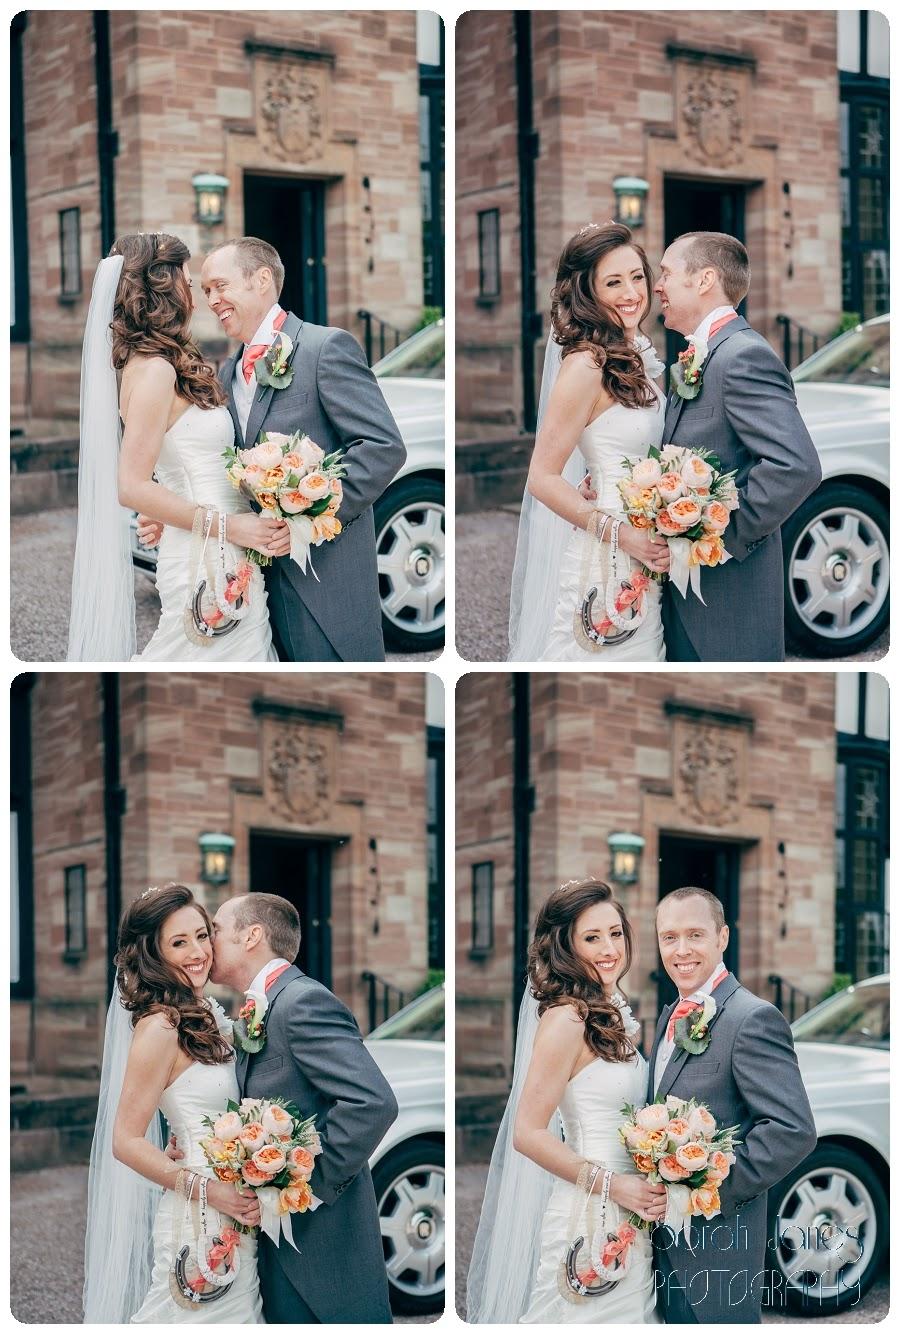 Wedding%2BPhotography%2BIngelwood%2BManor%2C%2BWedding%2Bphotography%2BWirral_0027.jpg